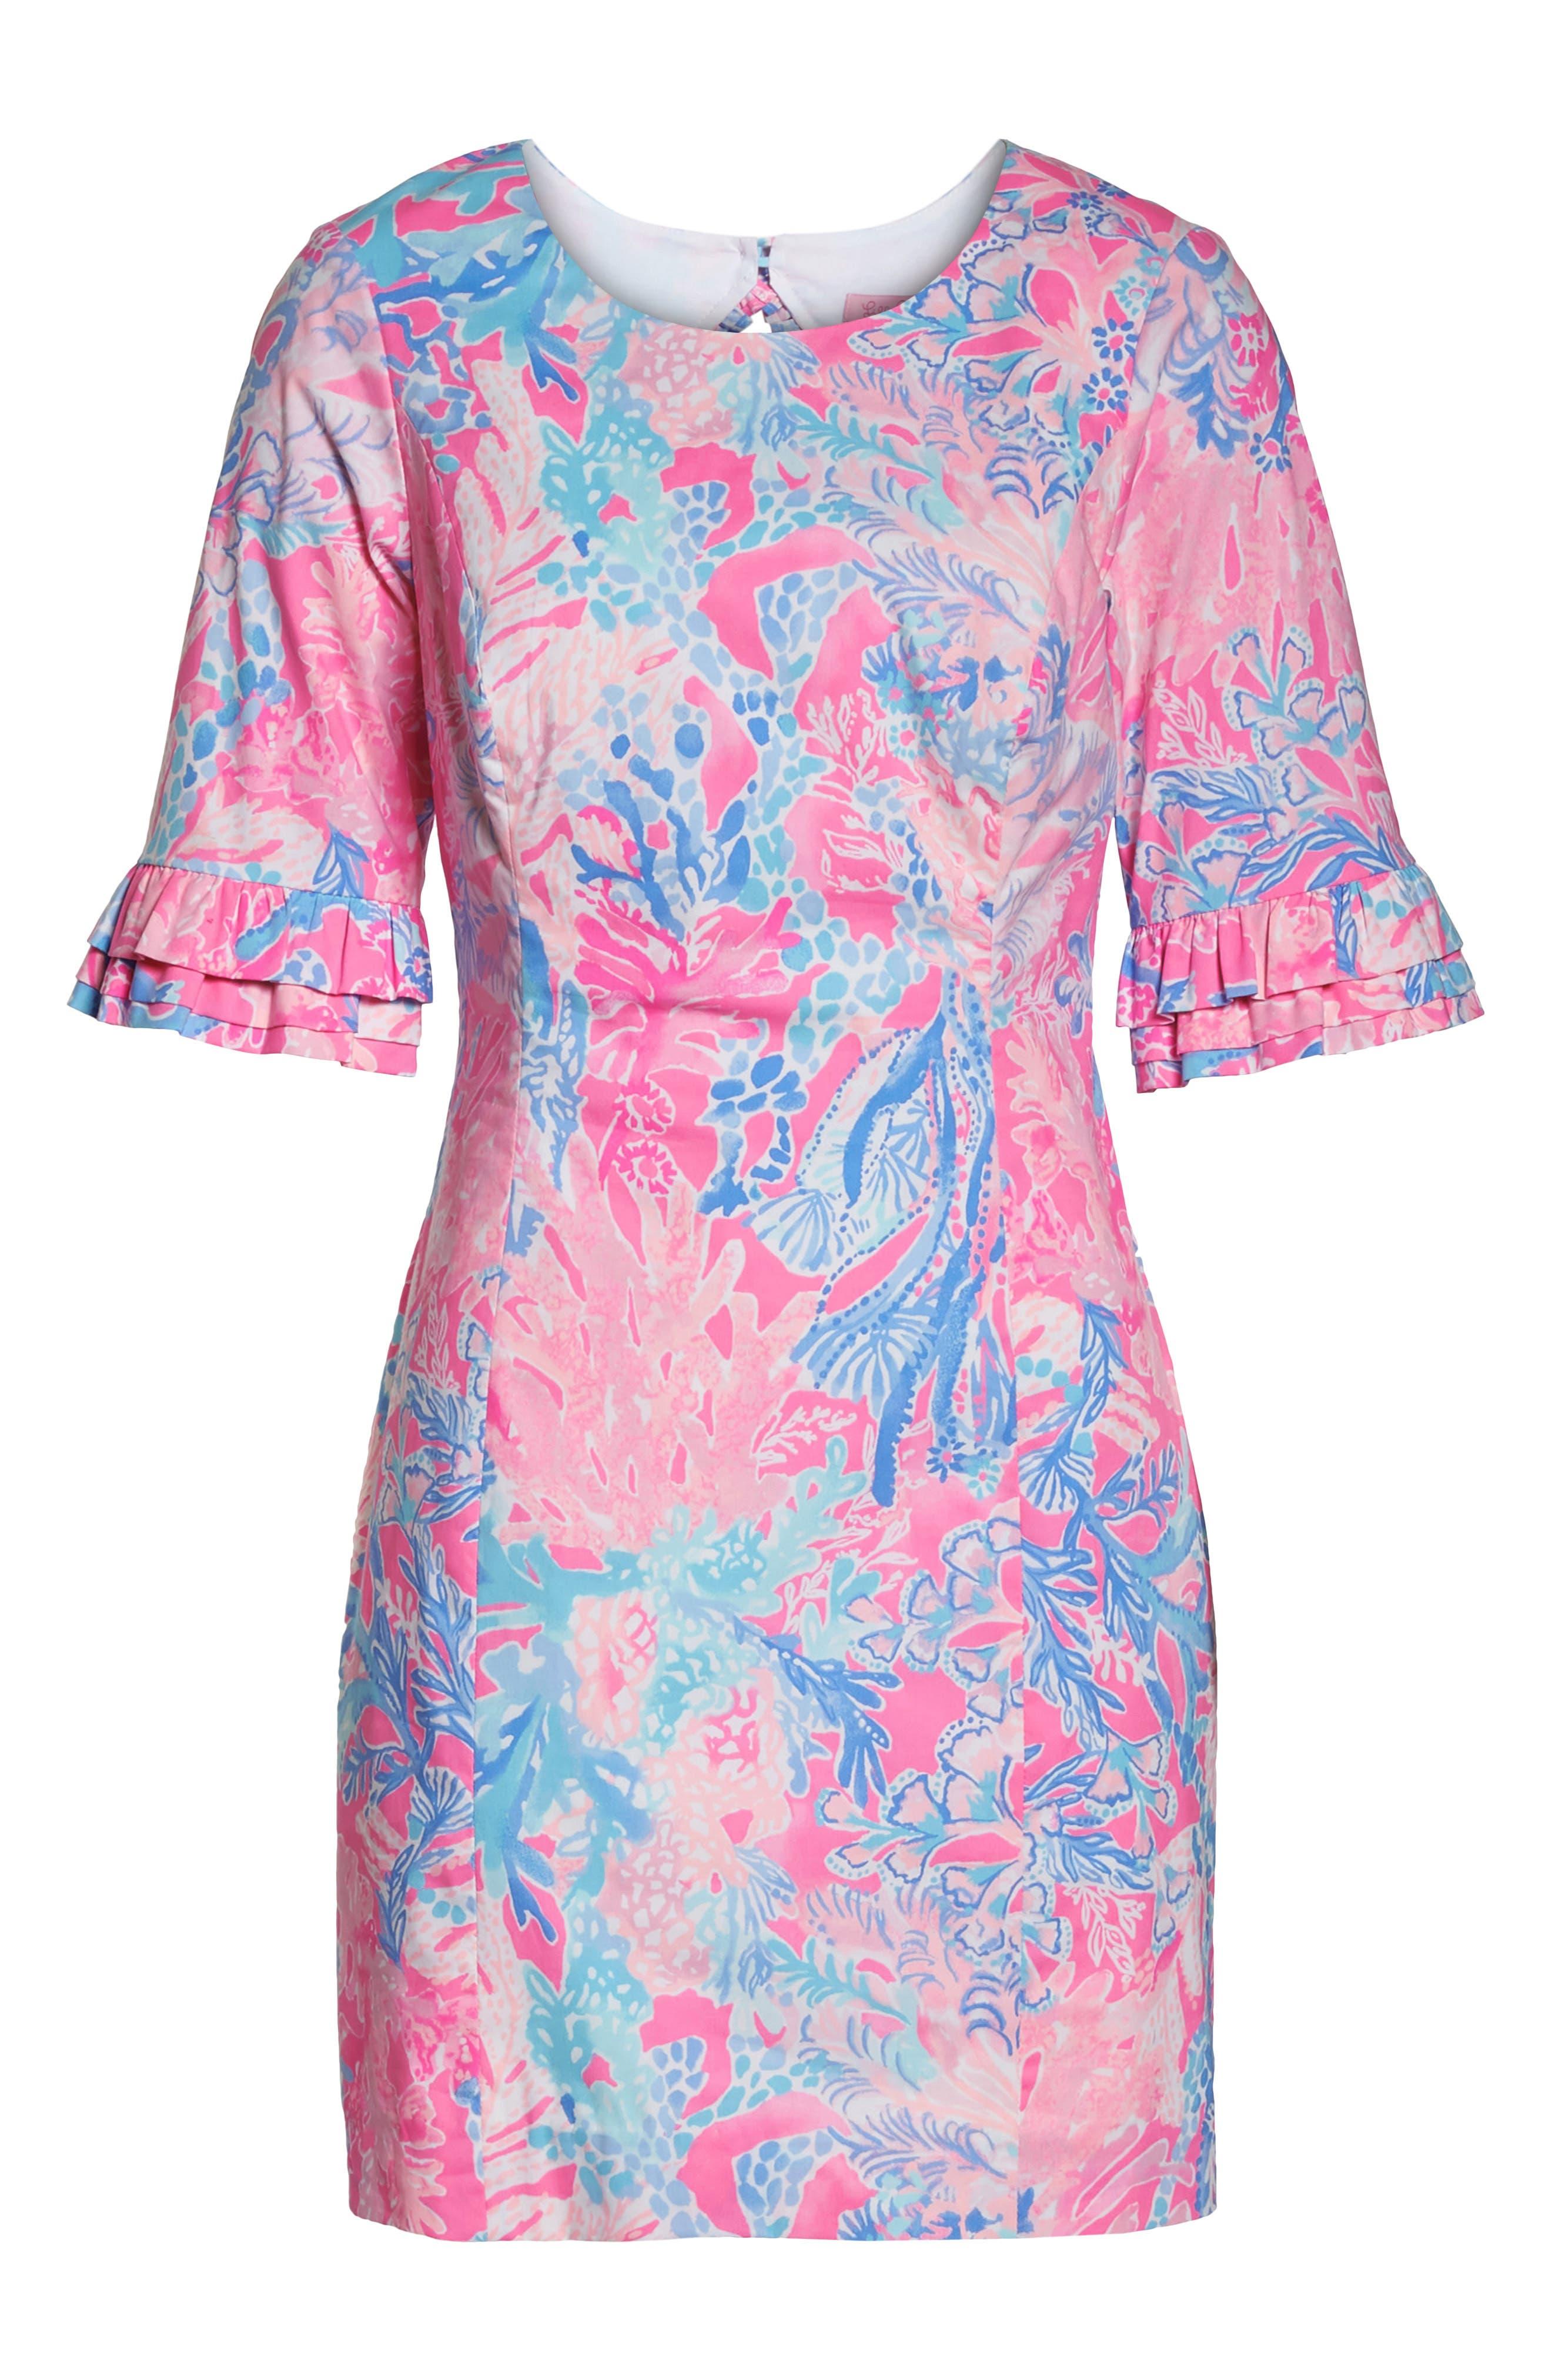 Fiesta Stretch Sheath Dress,                             Alternate thumbnail 7, color,                             LIGHT PASCHA PINK AQUADESIAC